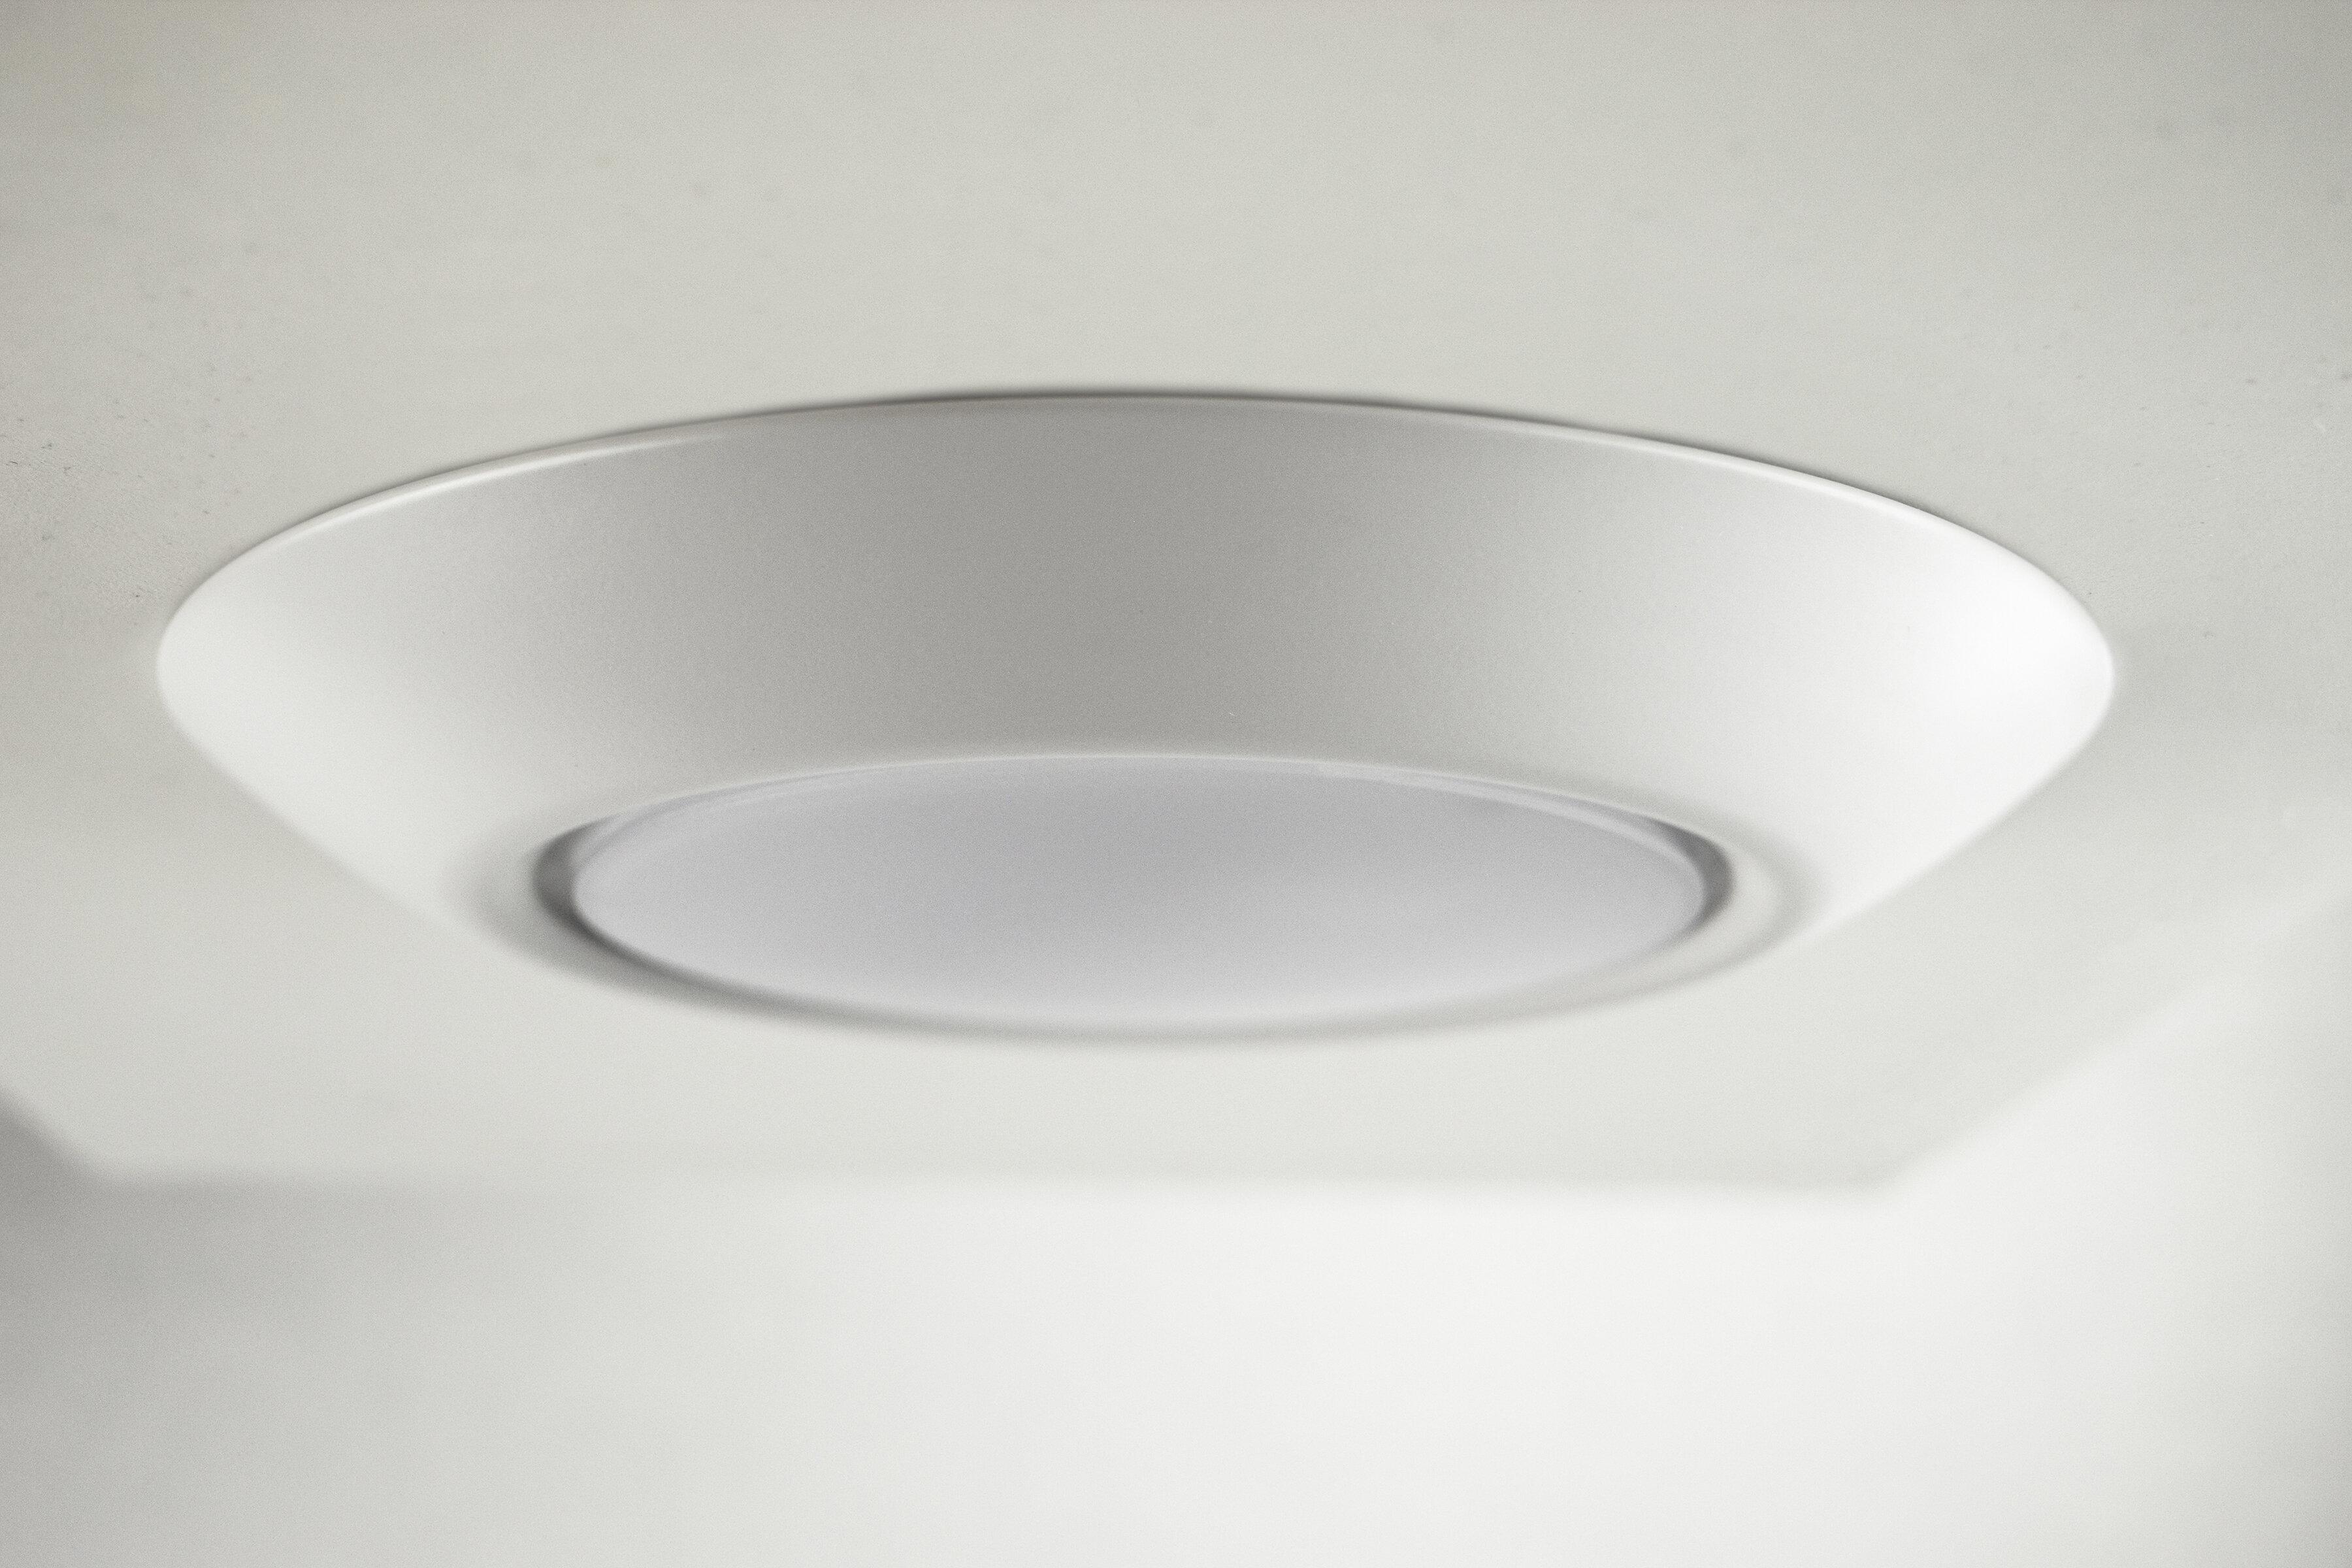 Ebern Designs Lospalmos 1 Light 7 5 Simple Circle Led Flush Mount Reviews Wayfair